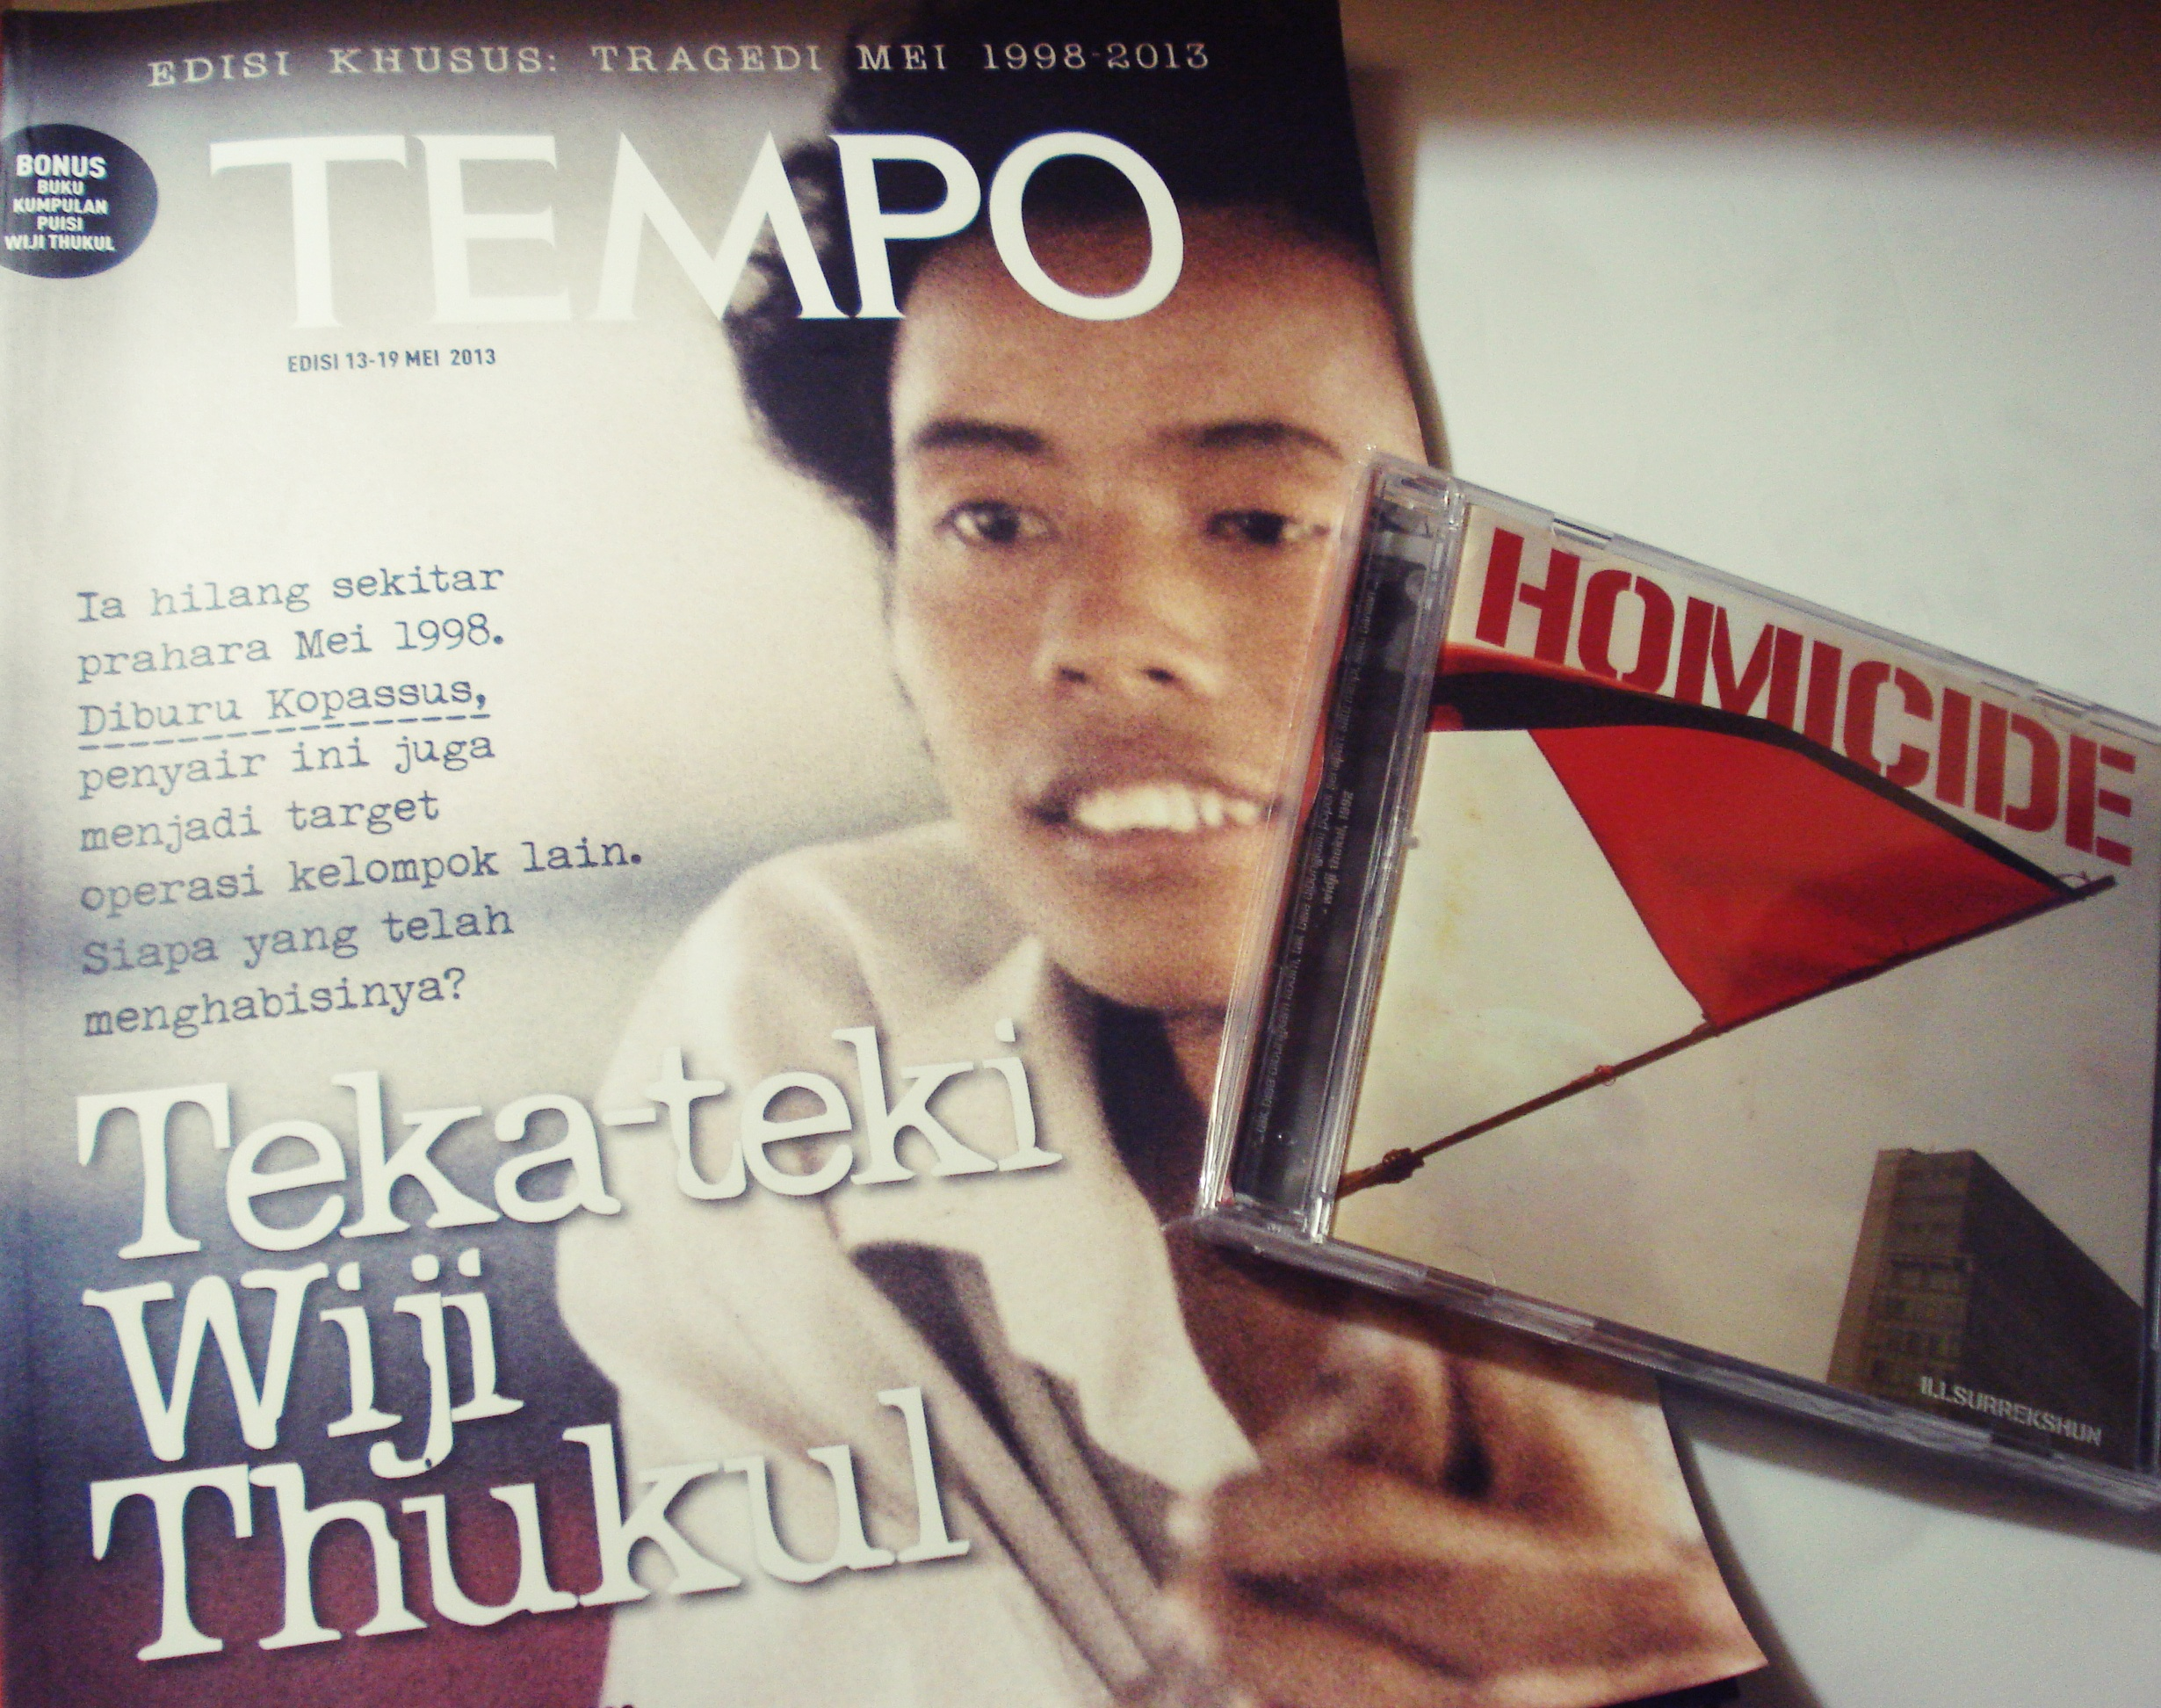 Tempo Edisi Khusus Tragedi Mei 1998 2015 Wiji Thukul LITTLE PISTON